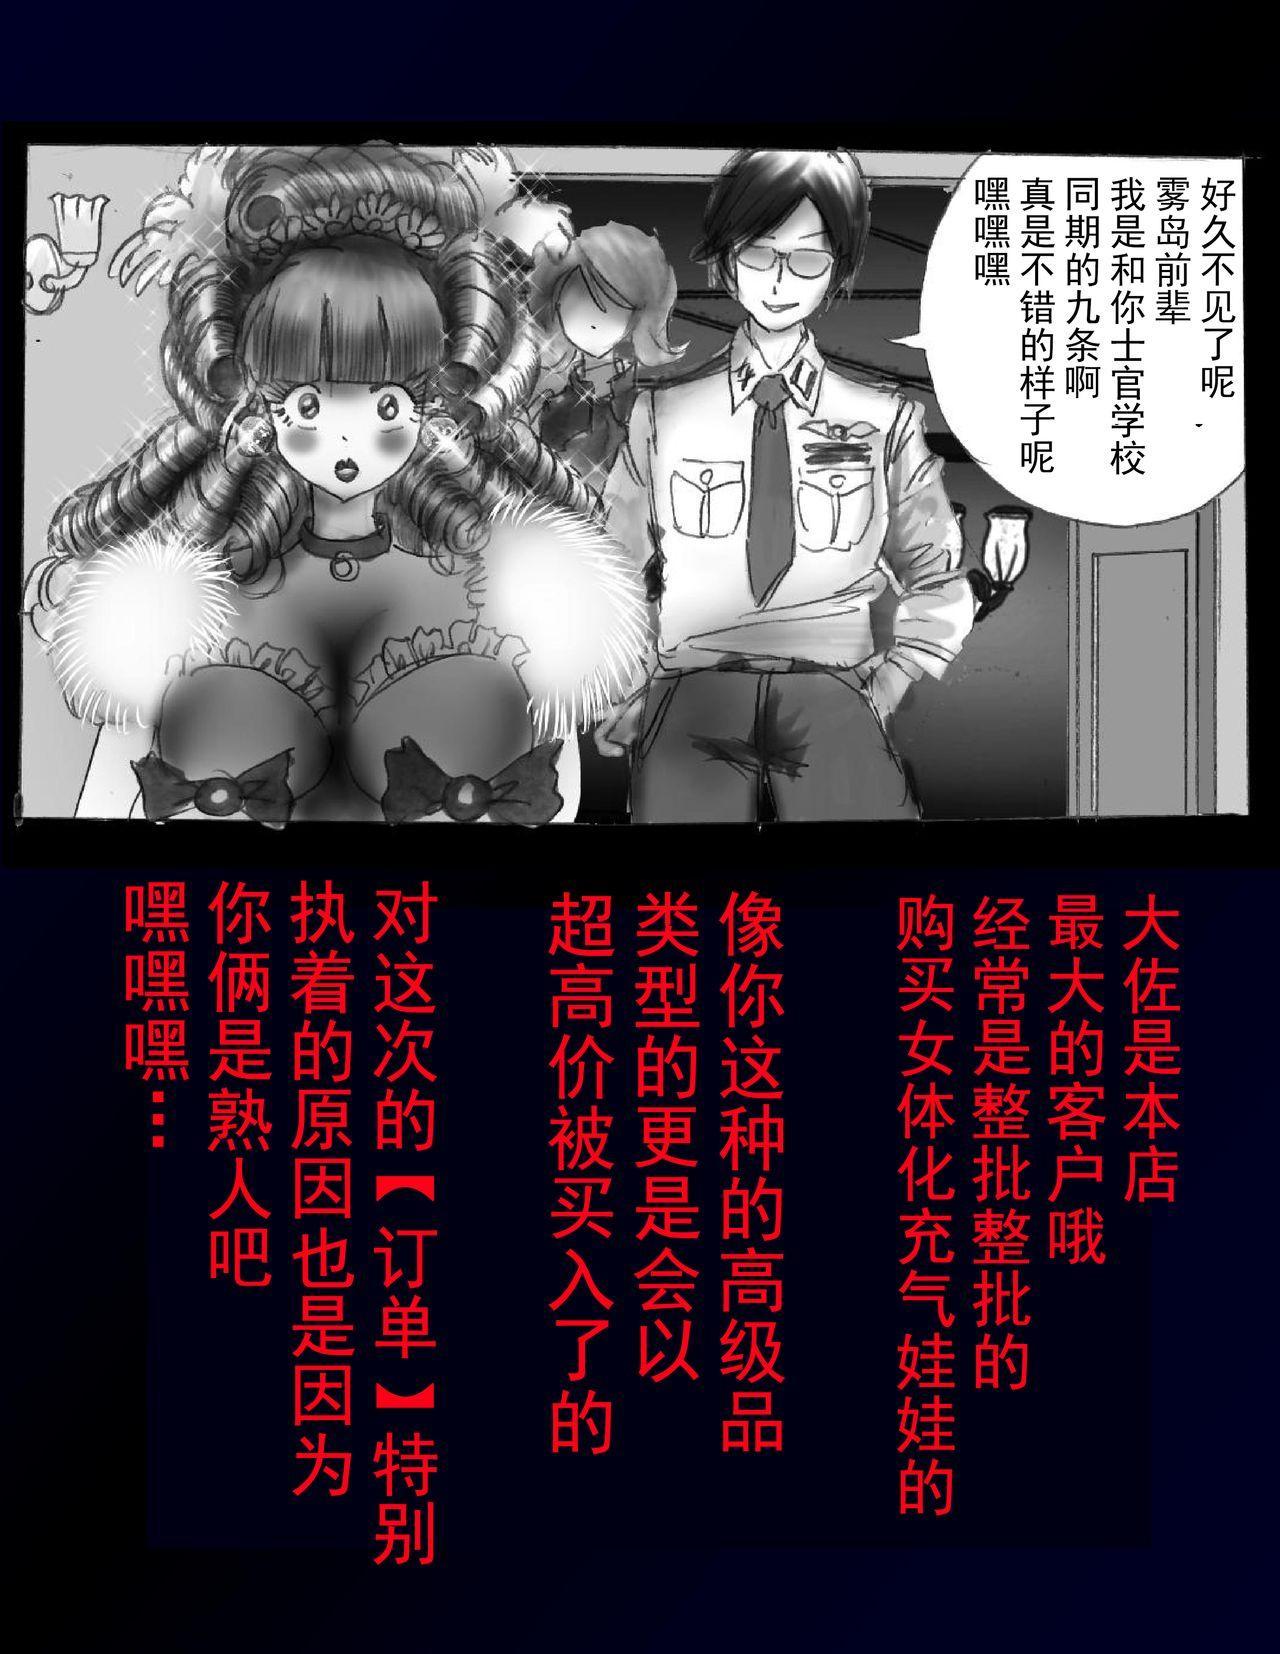 Kyousei Nyotaika Dress 71